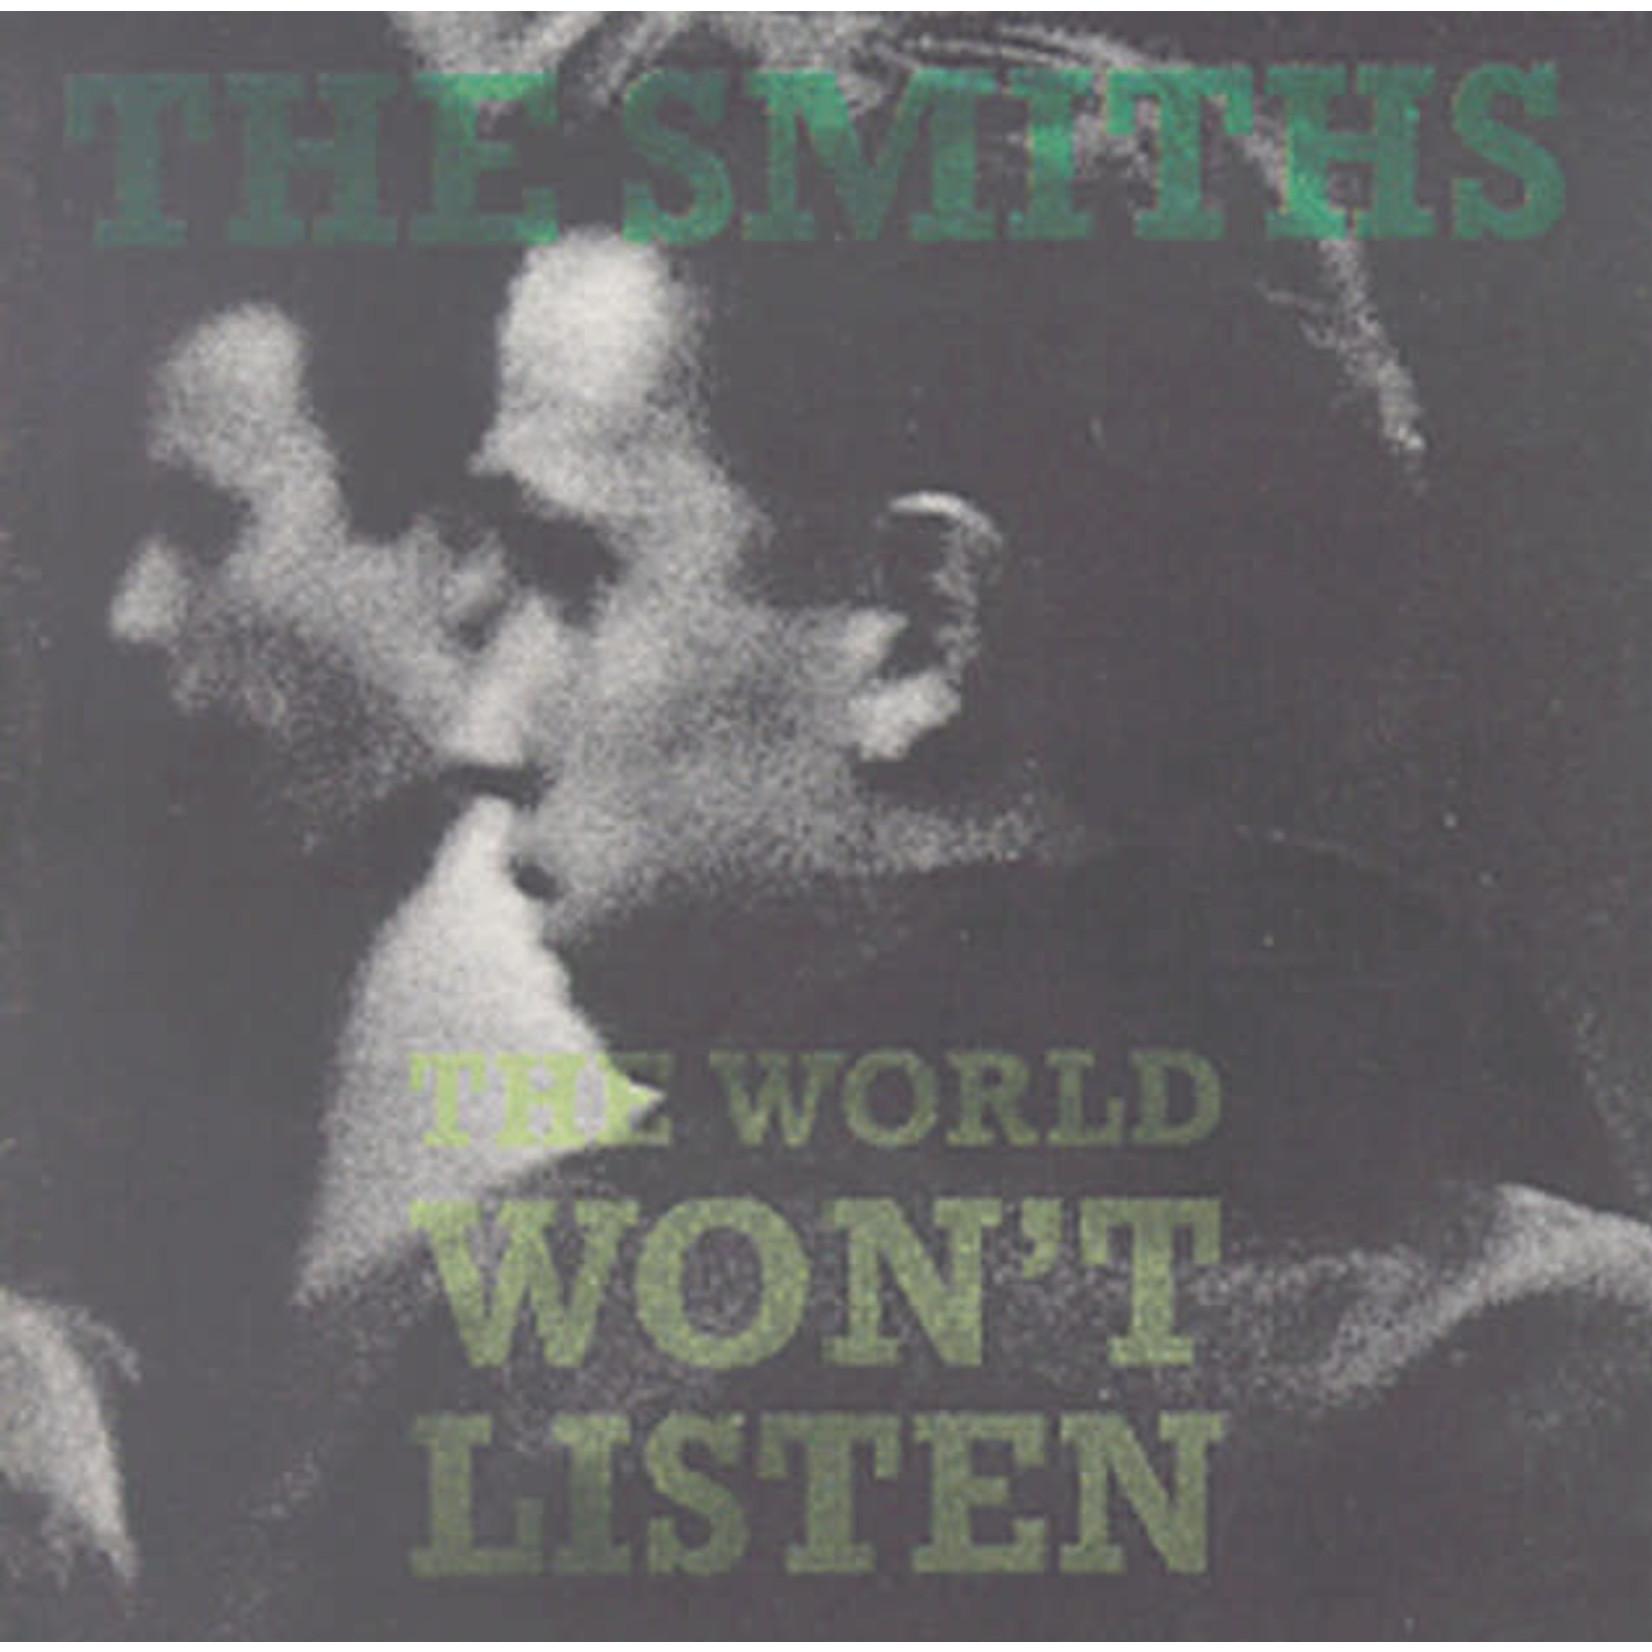 Vinyl The Smiths -The World Won't Listen